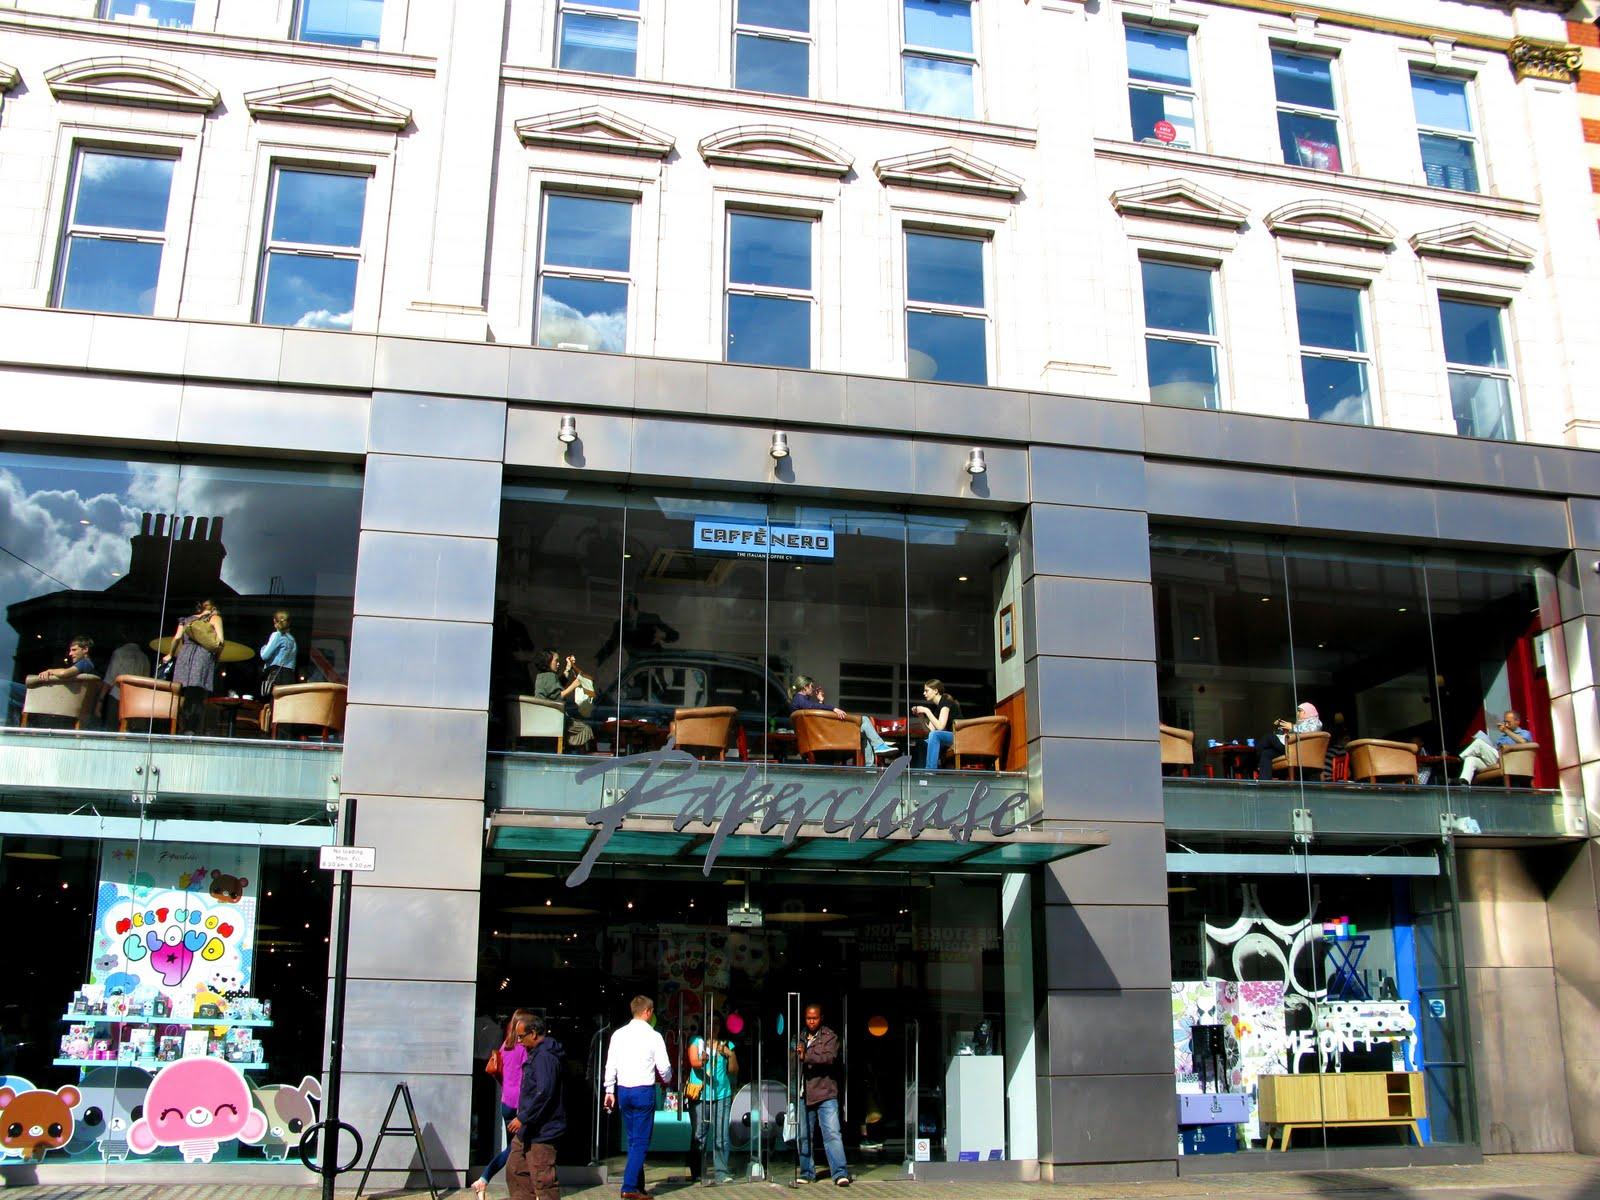 http://3.bp.blogspot.com/_3D_ZLOC0At4/TFBBGBNMFRI/AAAAAAAABKk/oQcKGk5m-qY/s1600/Paperchase_London.jpg